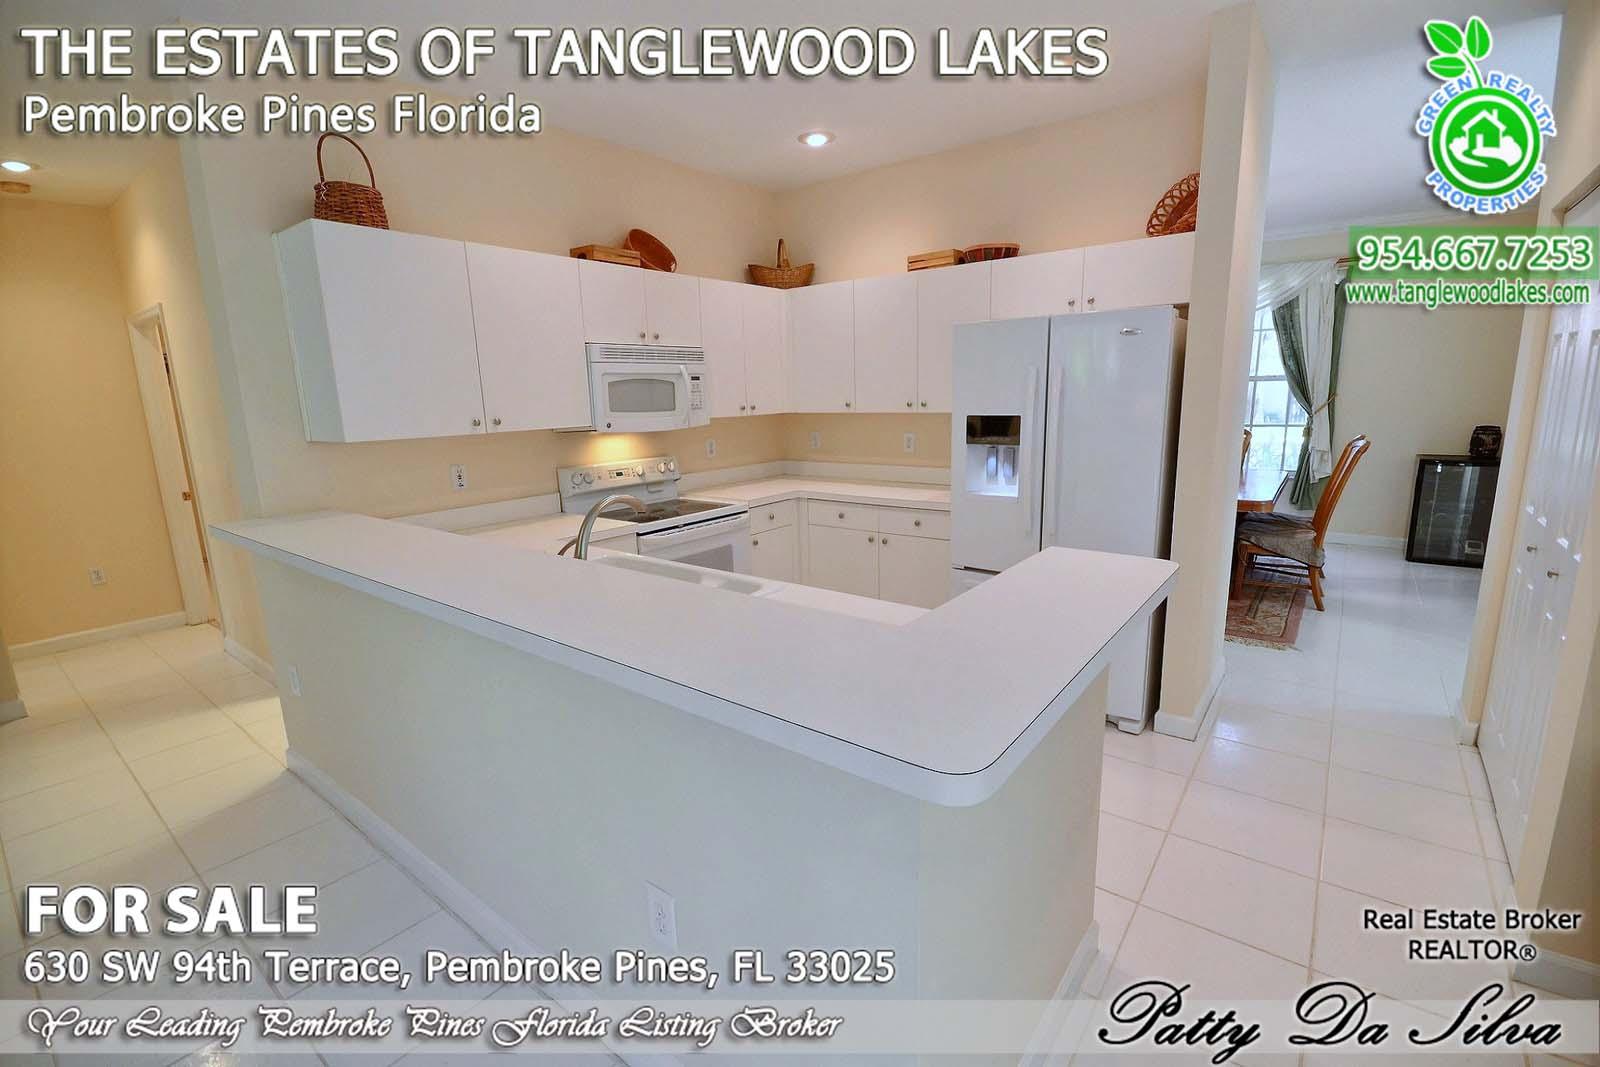 Tanglewood Lakes Homes in Pembroke Pines FL